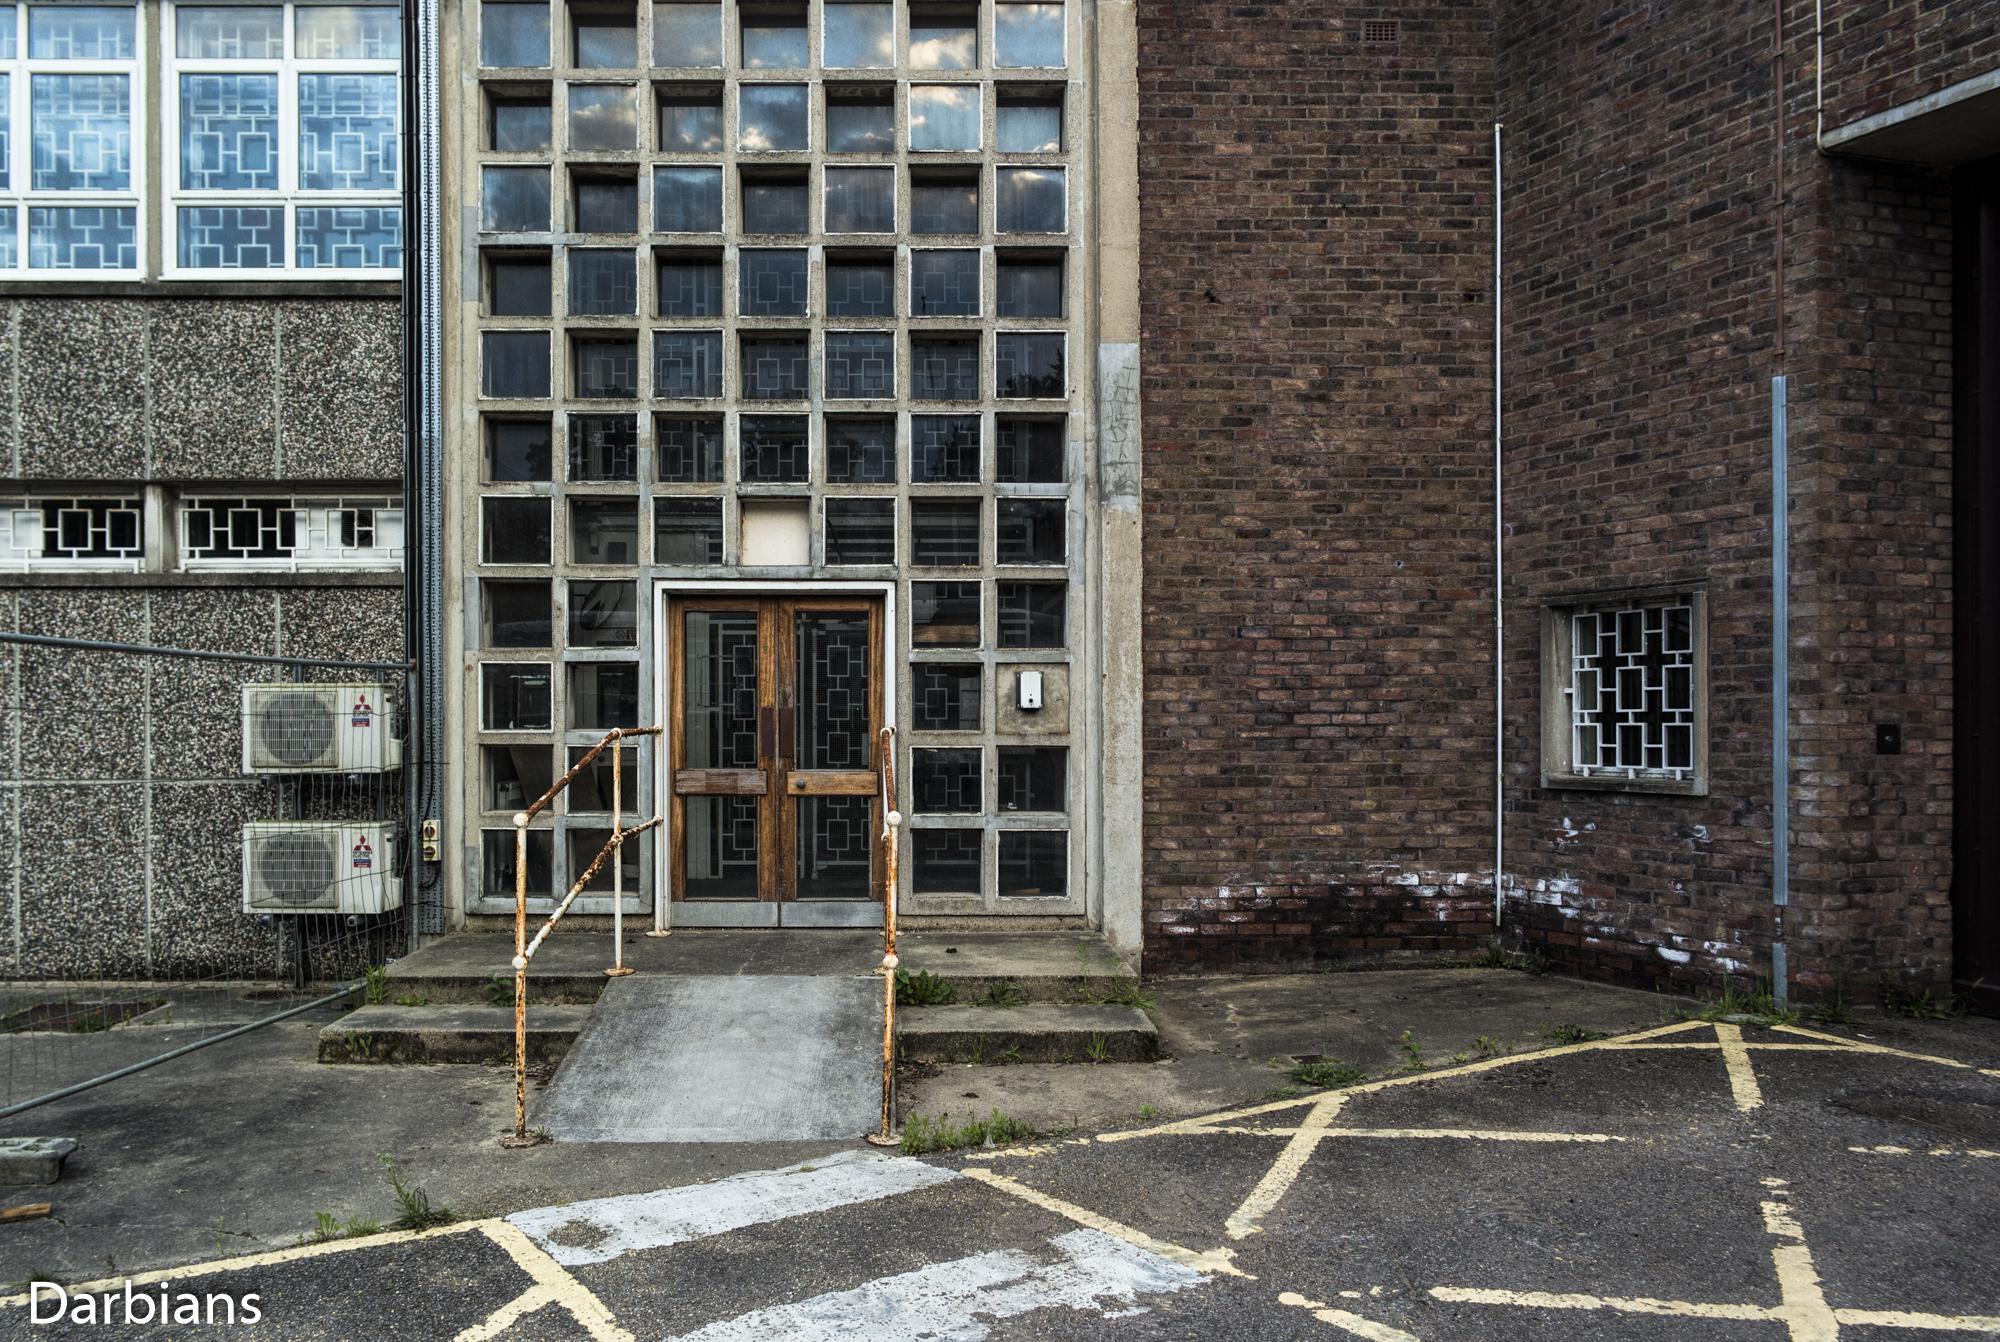 HMP Blundeston Prison. Entrance from the car park.